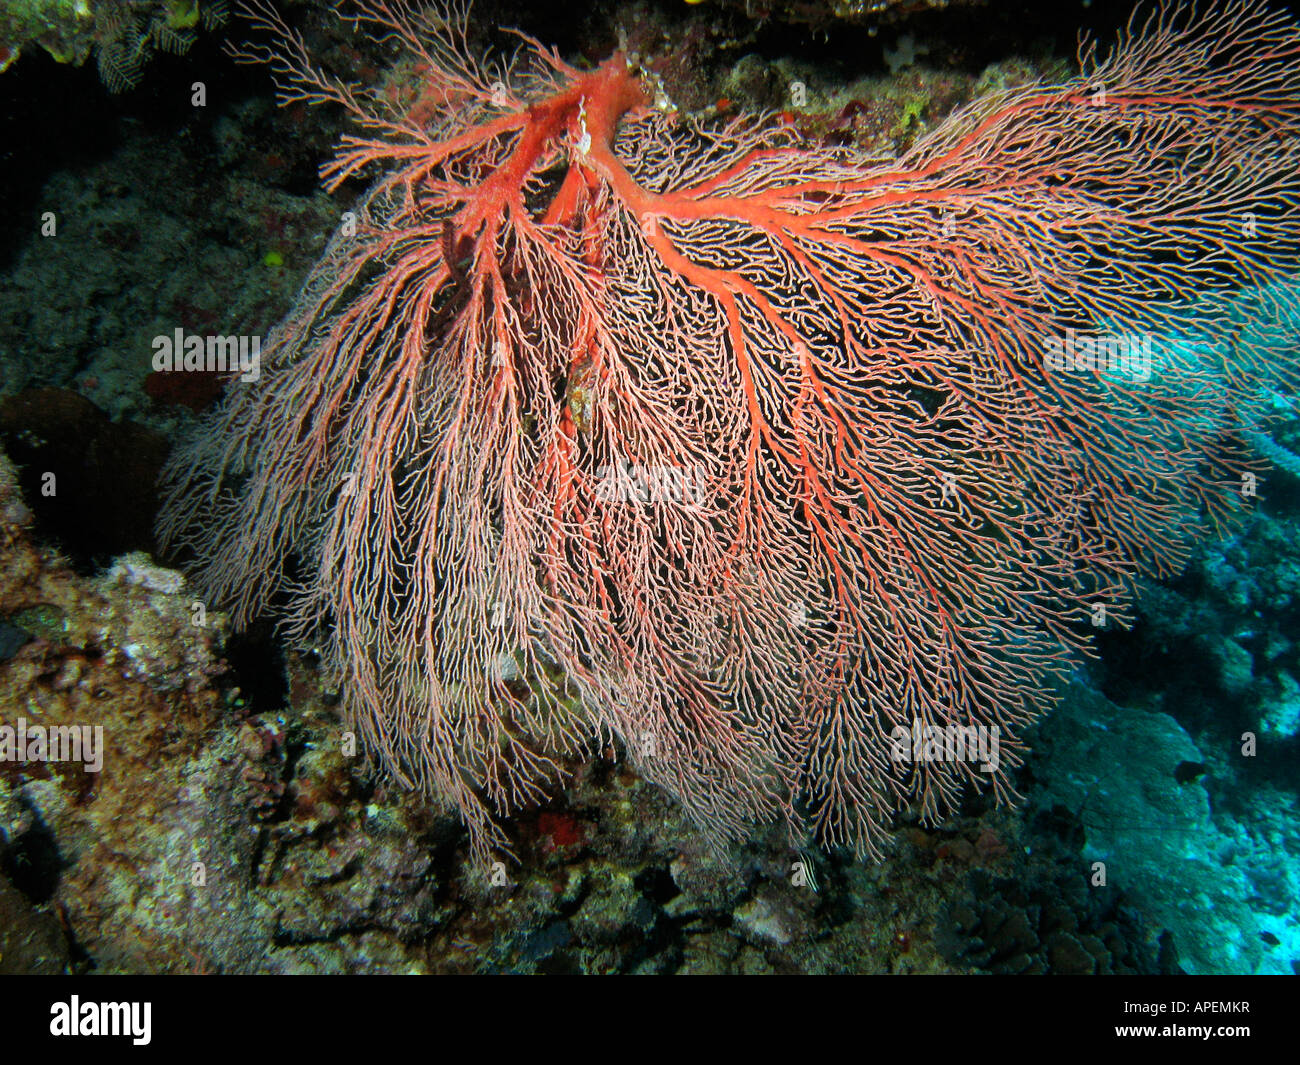 Fan Coral Agincourt Reef Great Barrier Reef North Queensland Australia Stock Photo